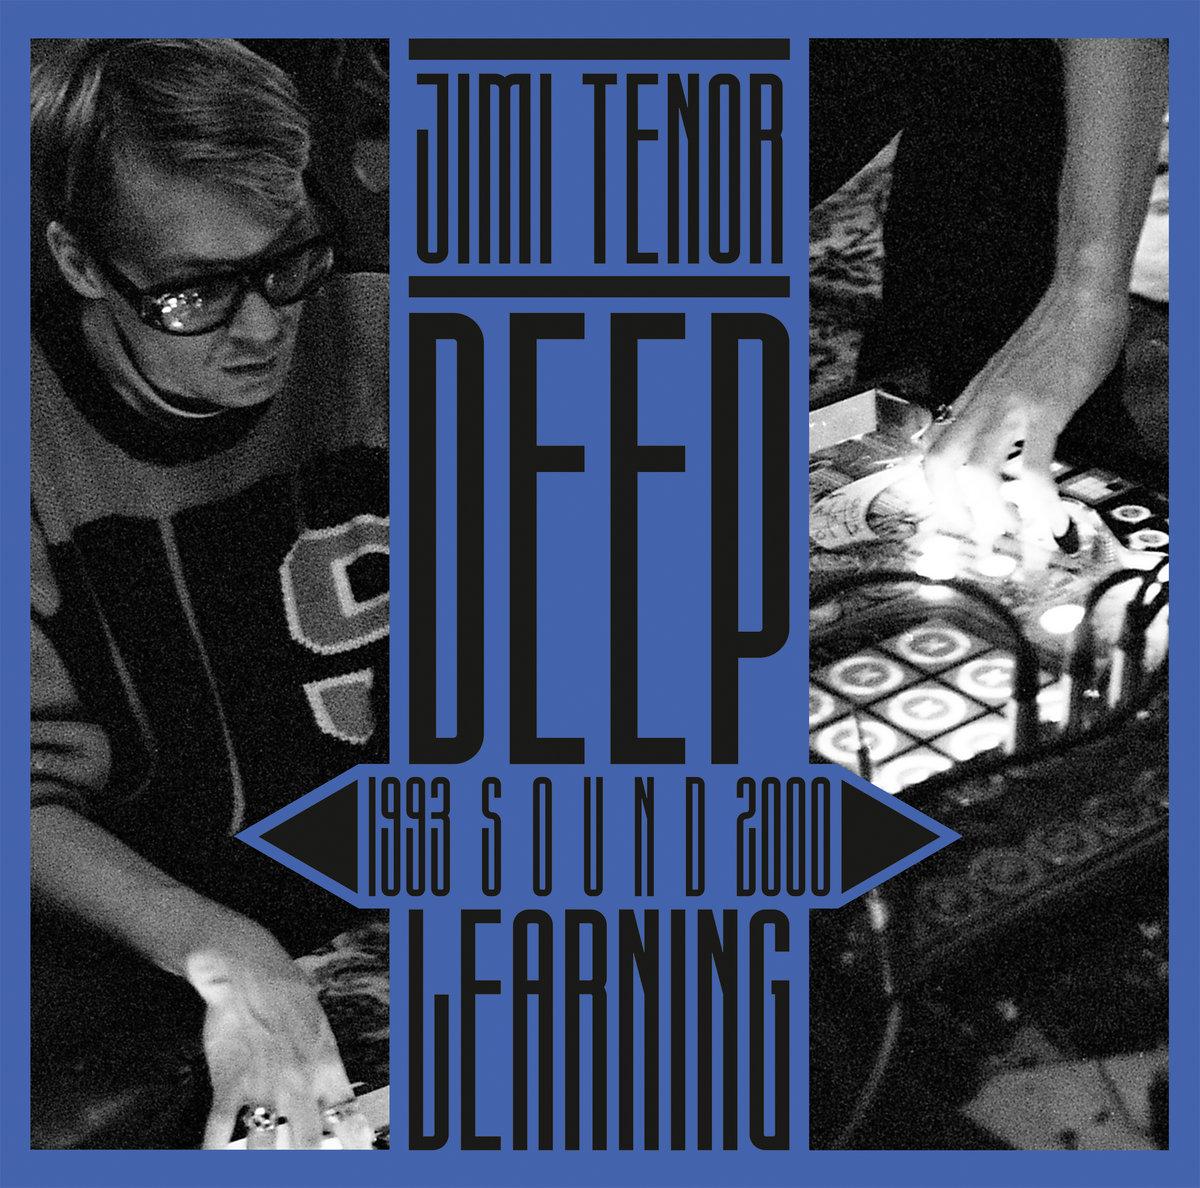 jimi-tenor-deep